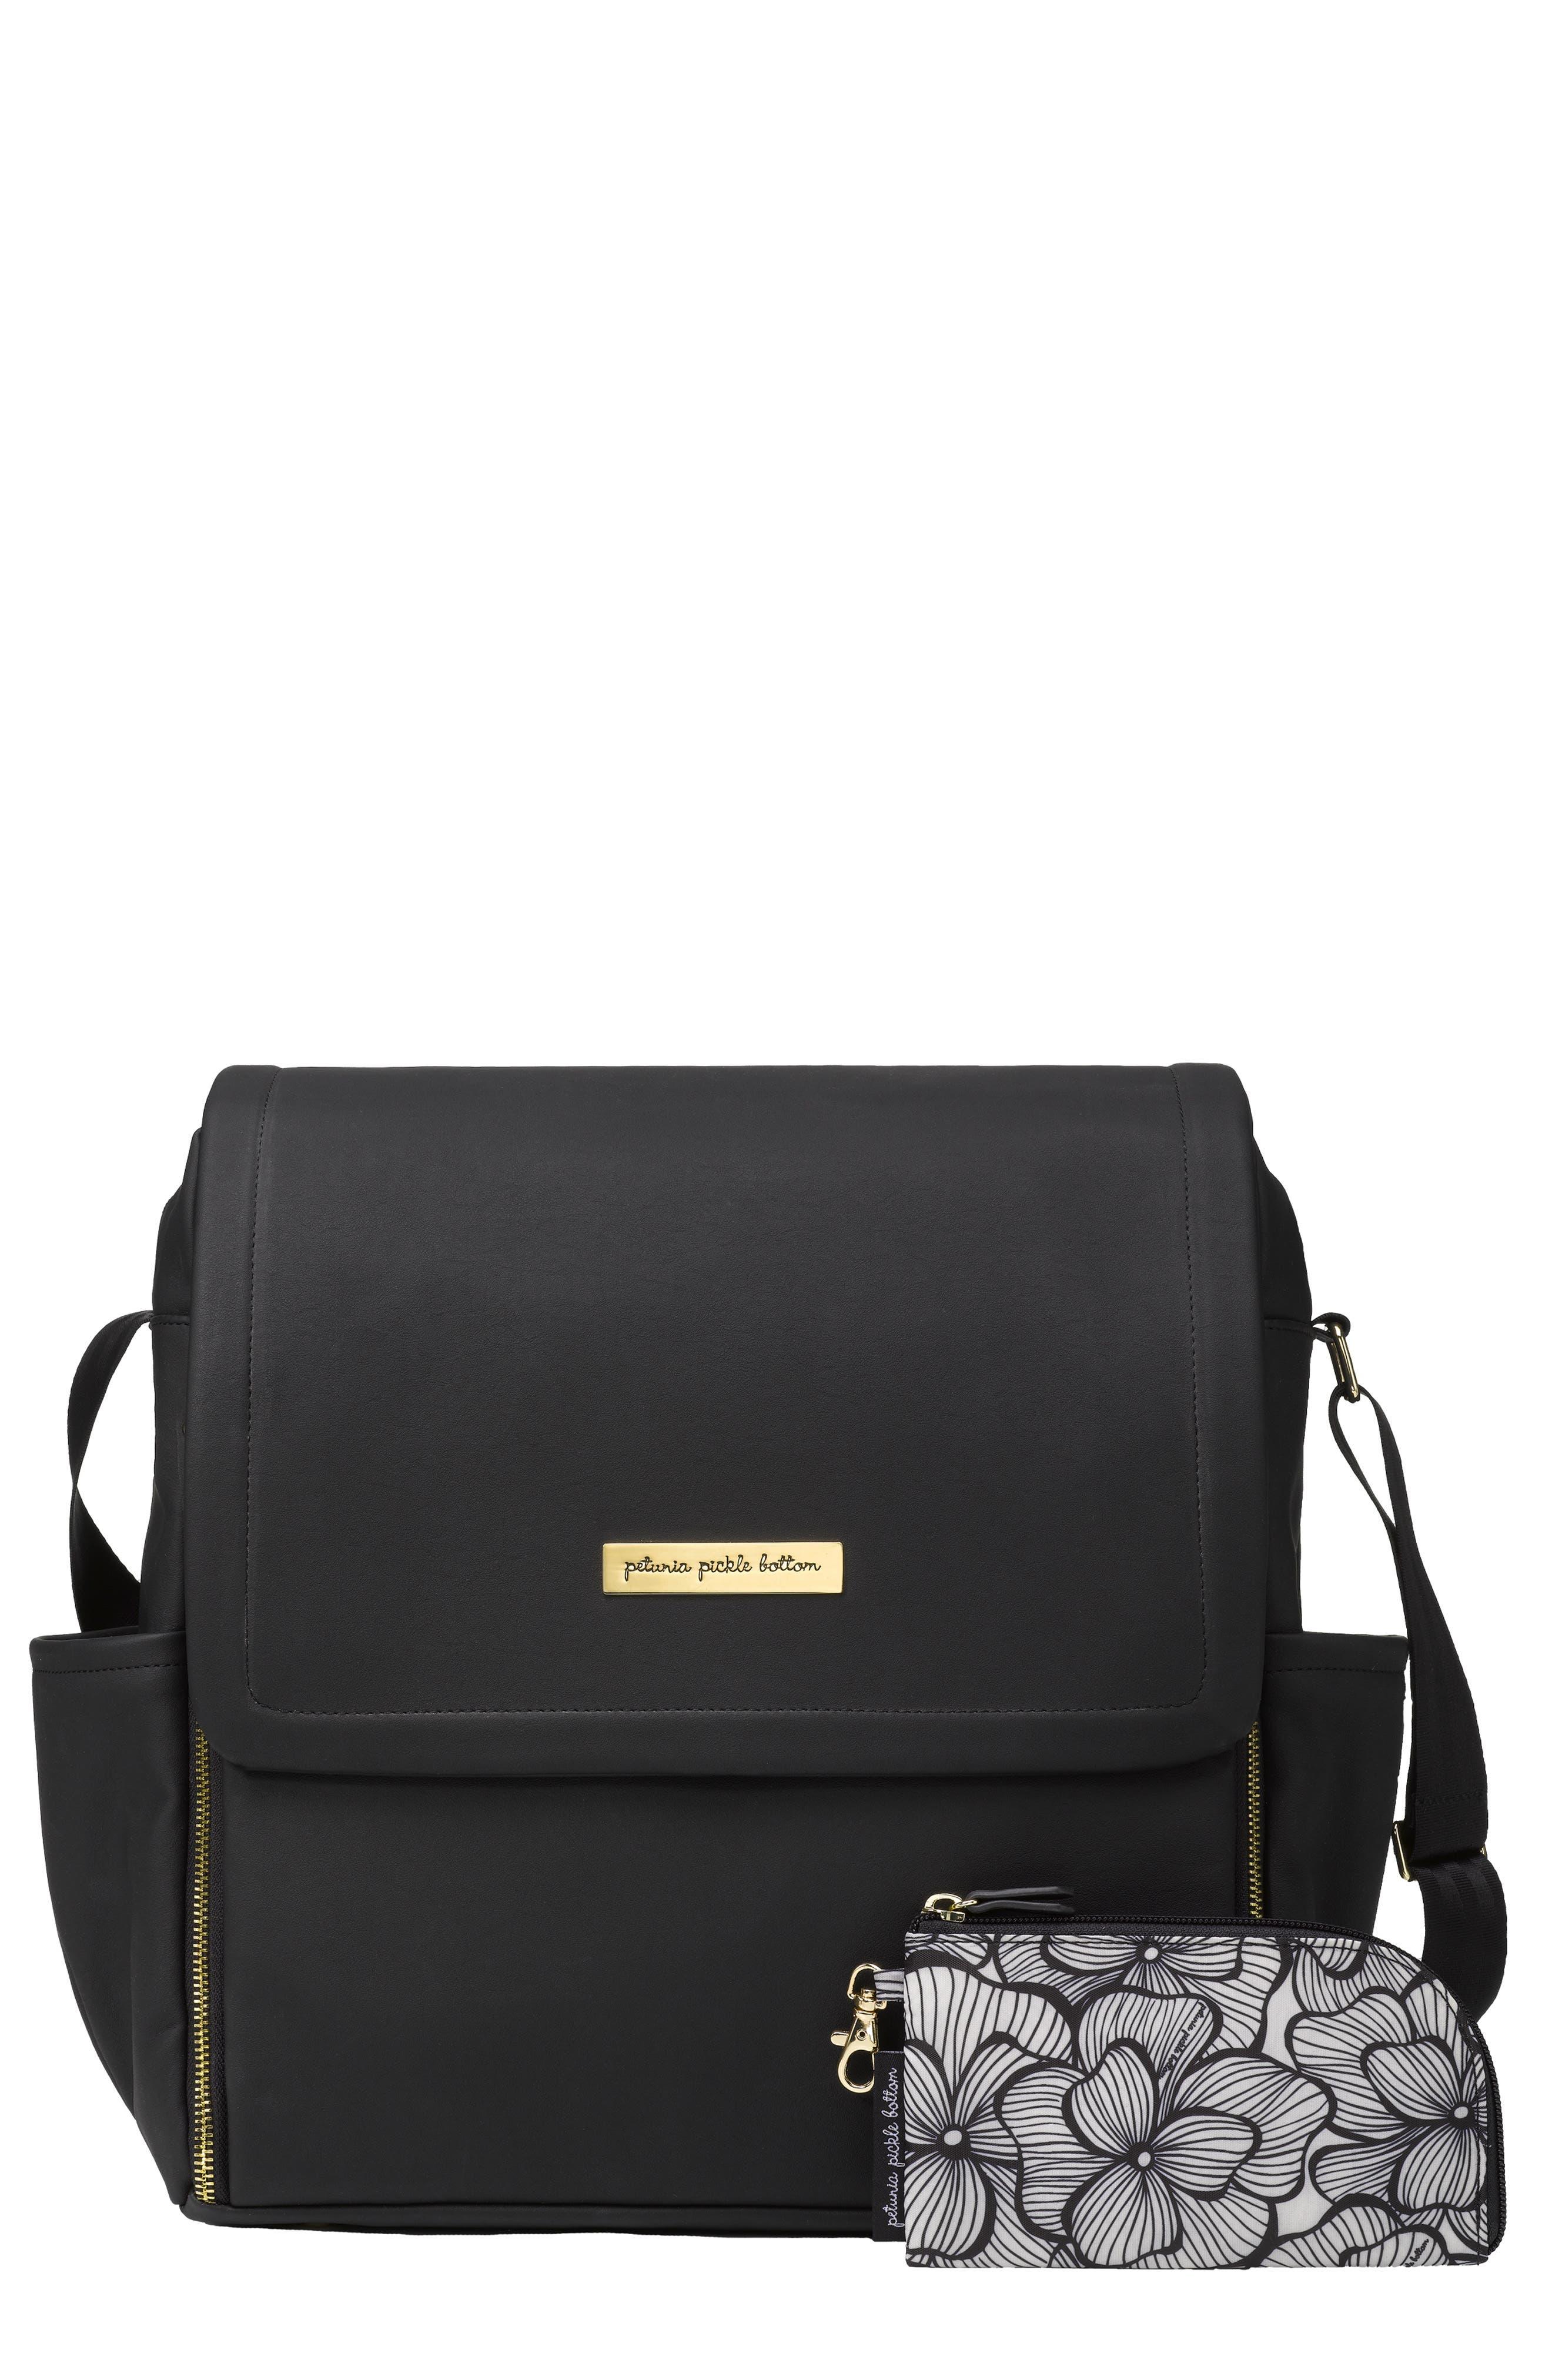 Boxy Backpack Diaper Bag,                         Main,                         color, BLACK MATTE LEATHERETTE